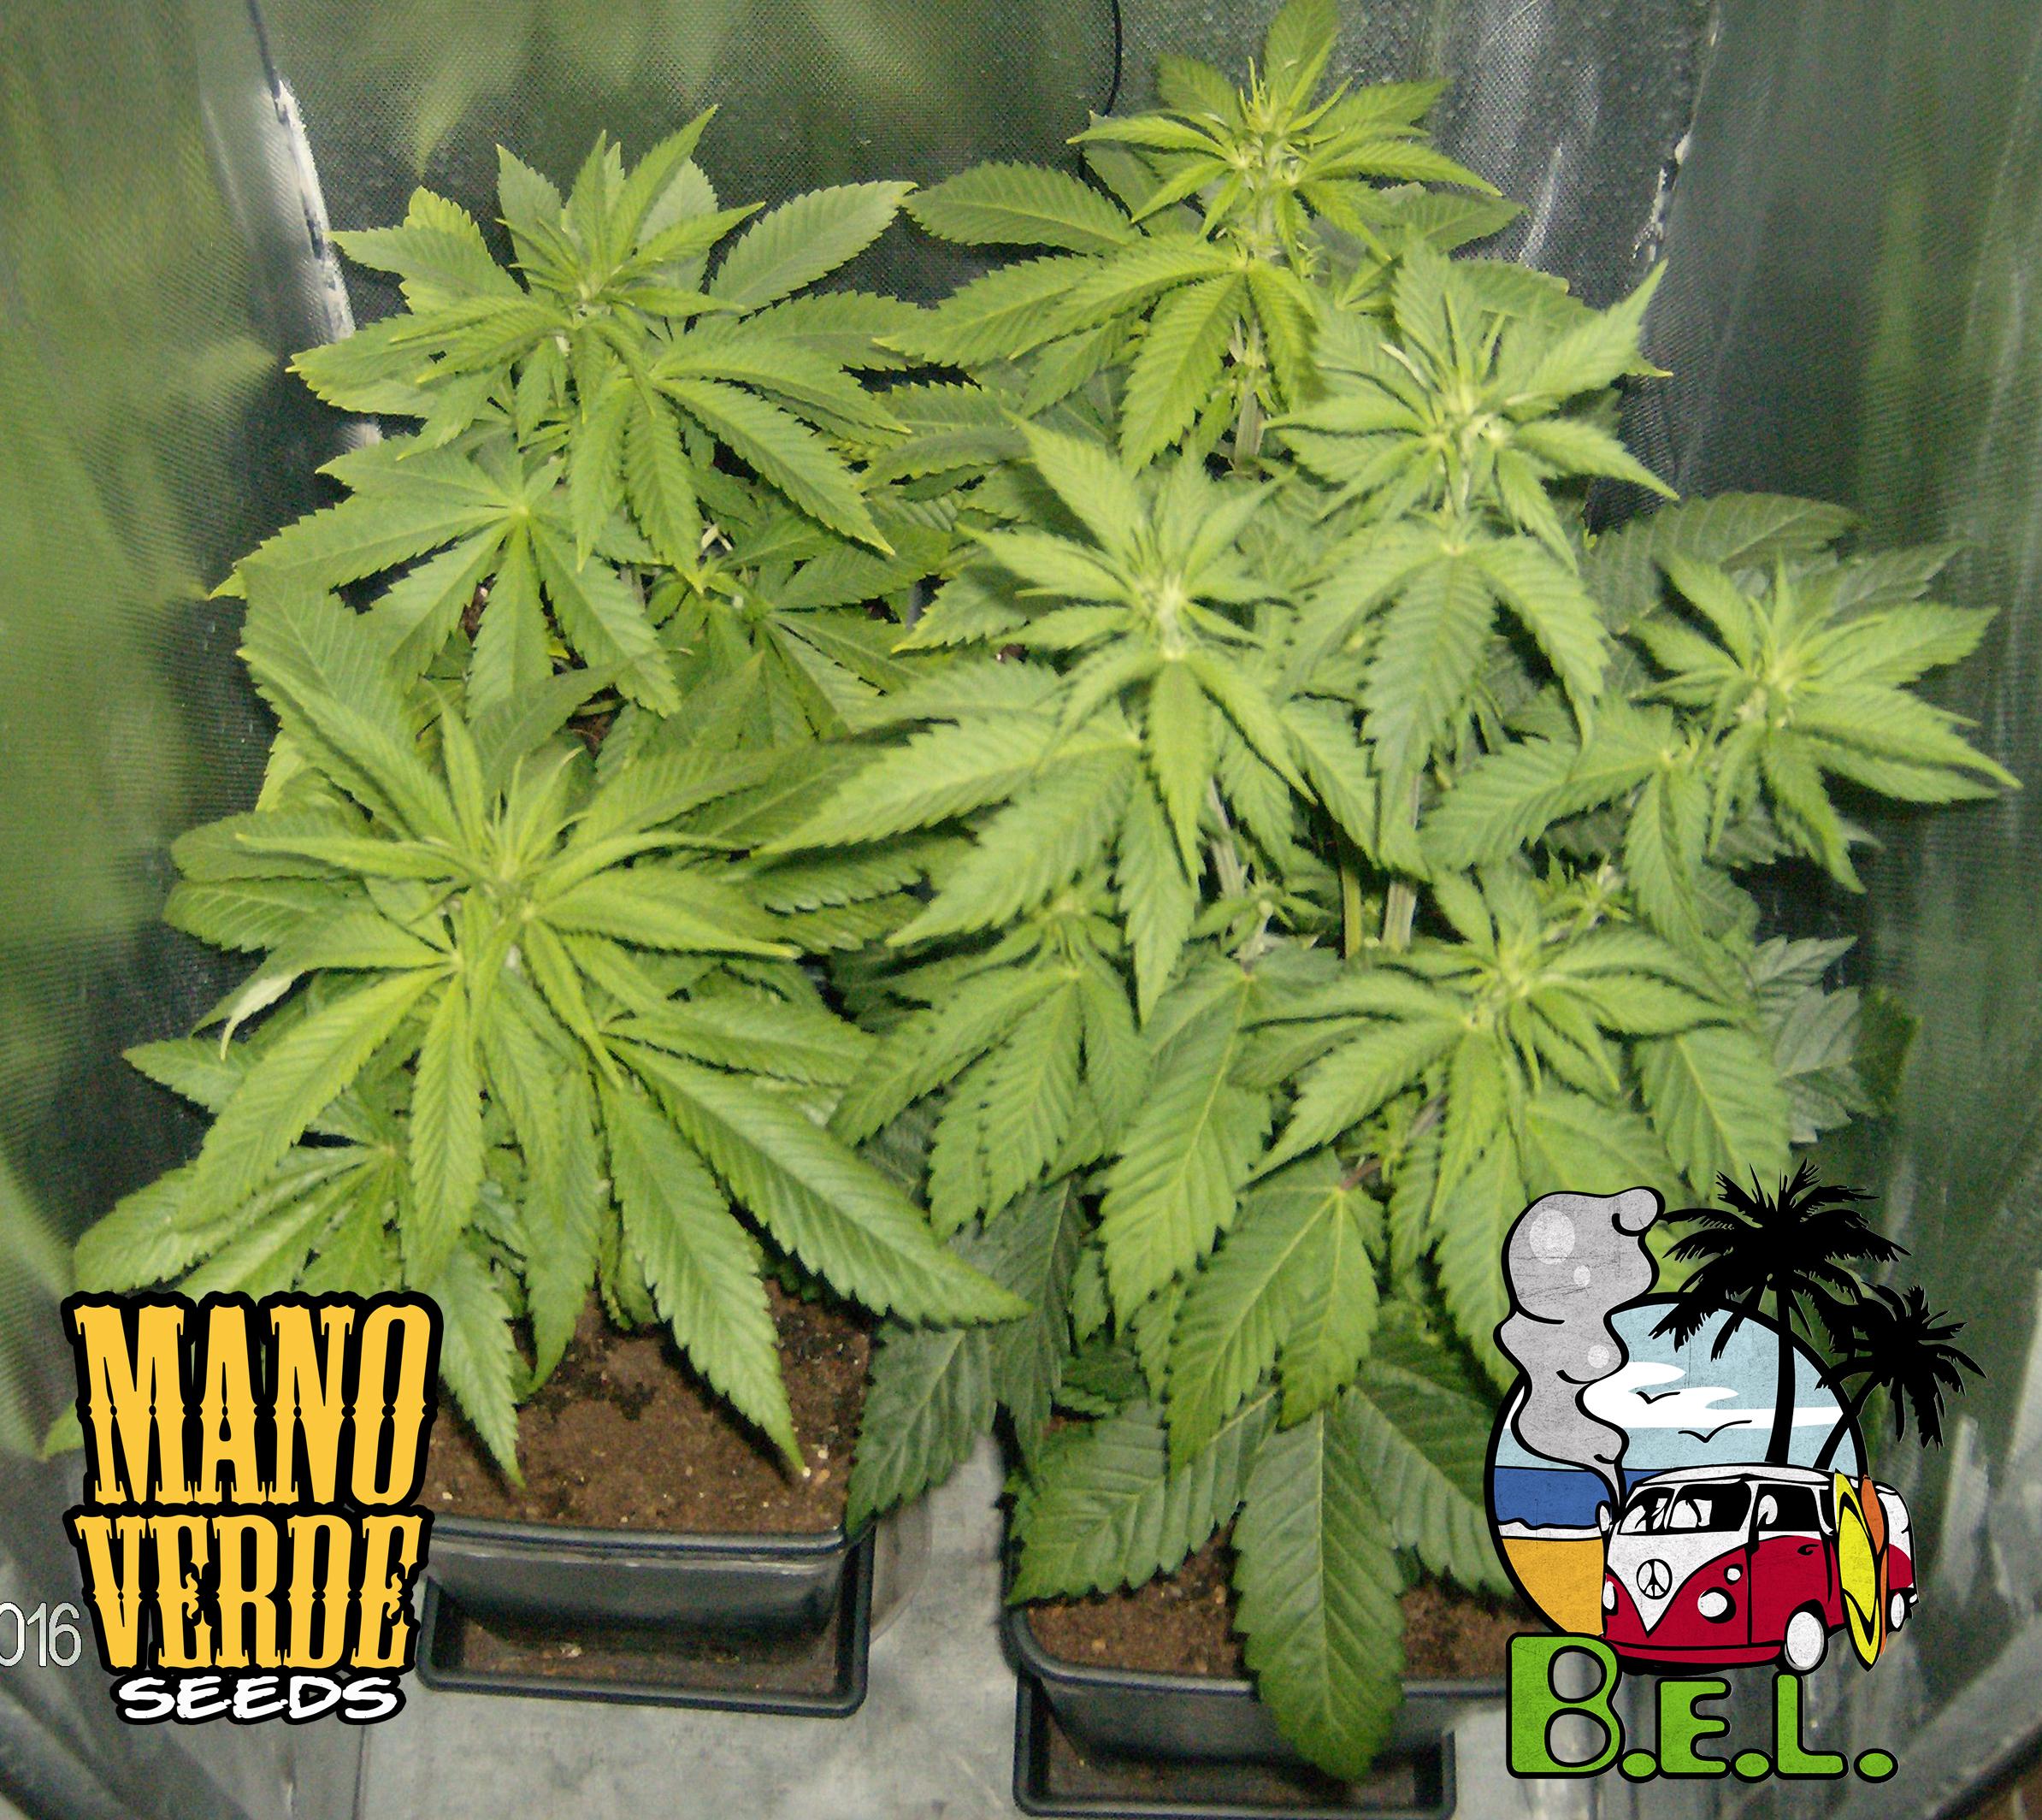 B.E.L. Manoverde Seeds 26C-14F - 230